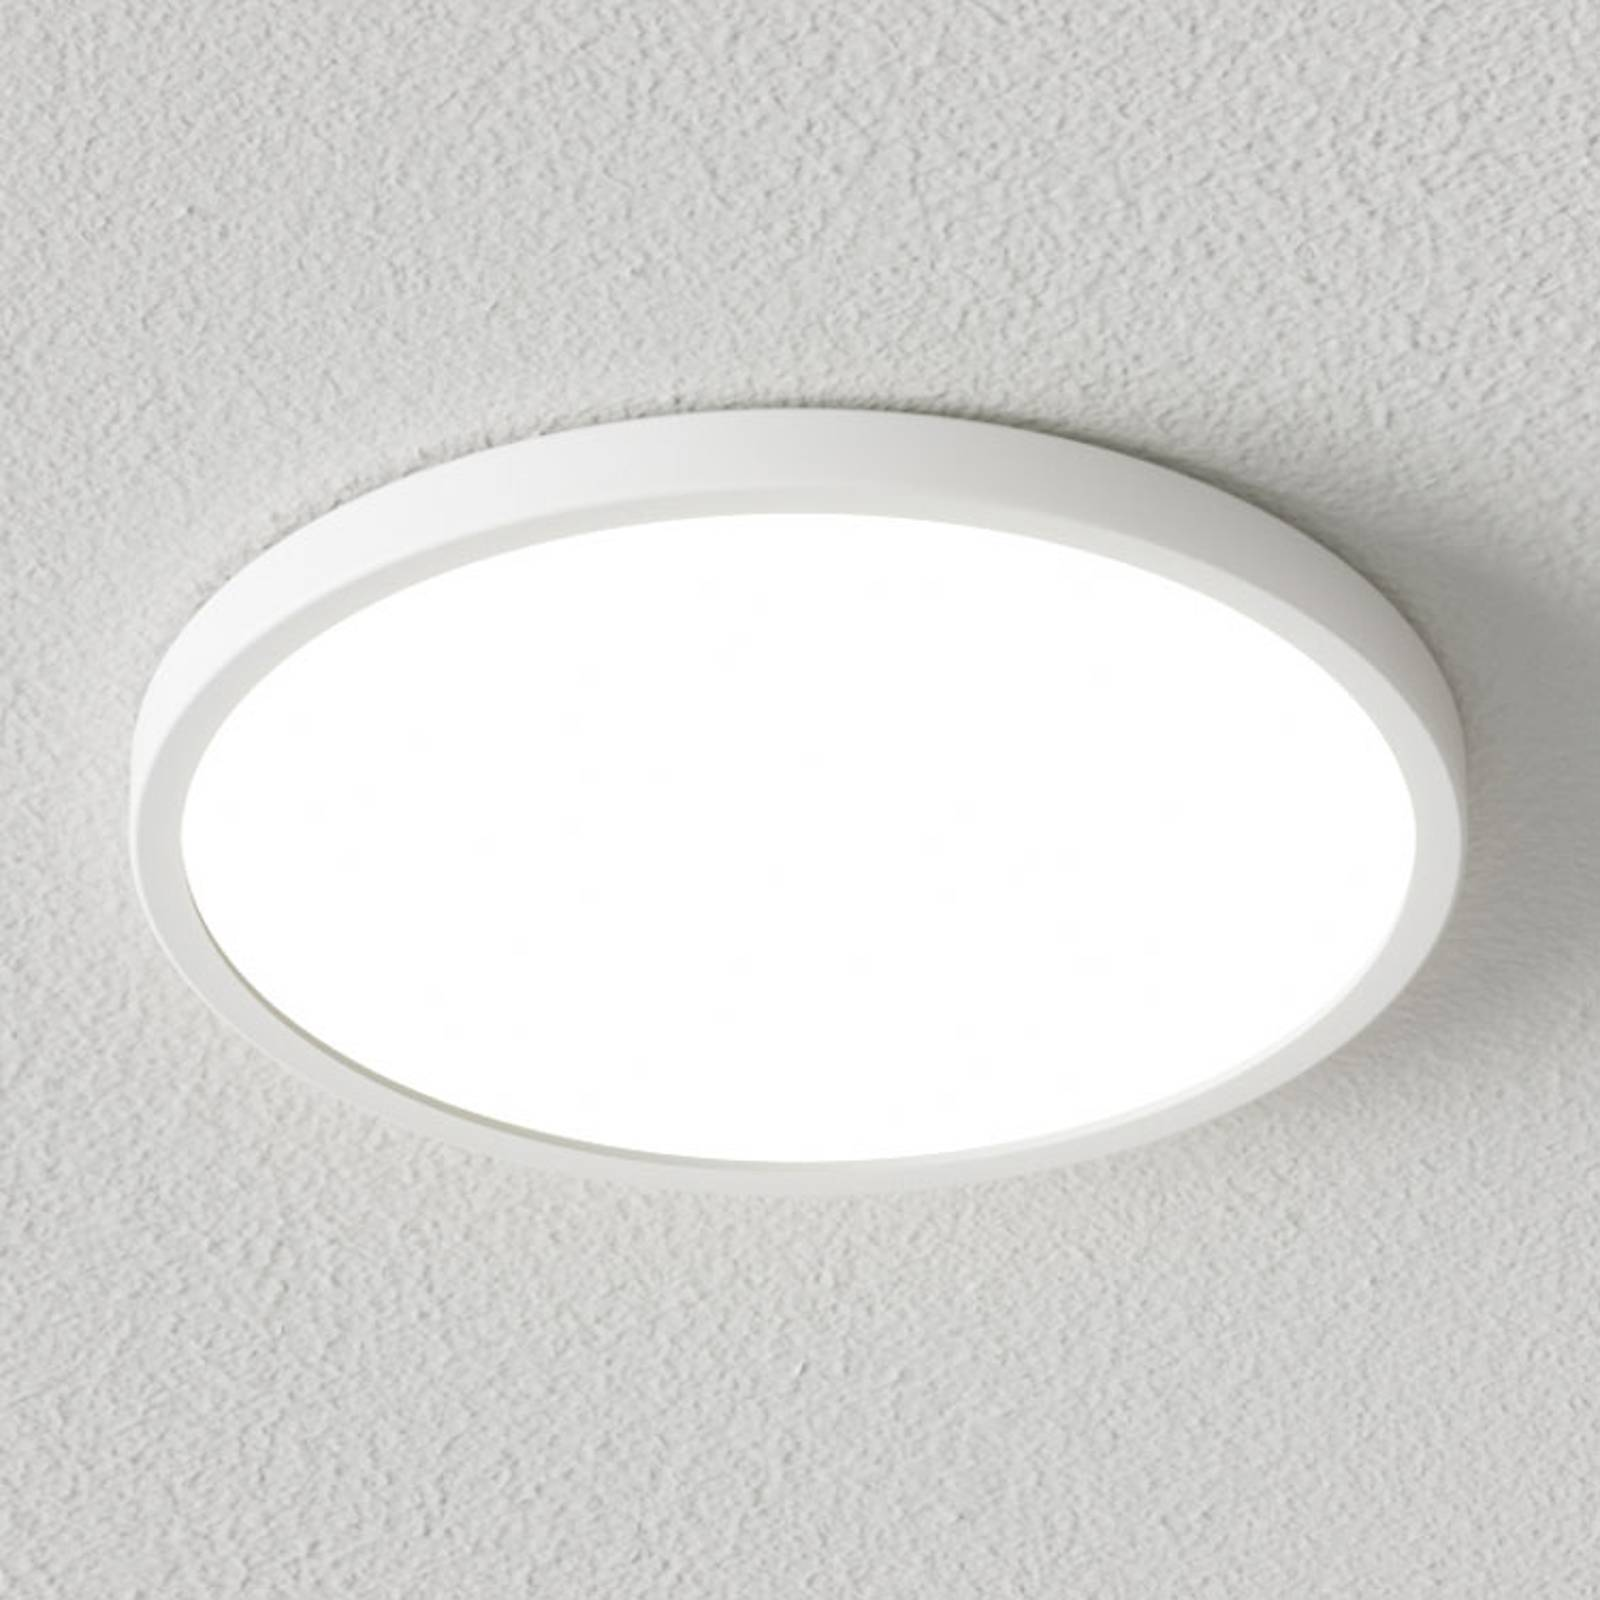 Dimbare LED plafondlamp Solvie in wit